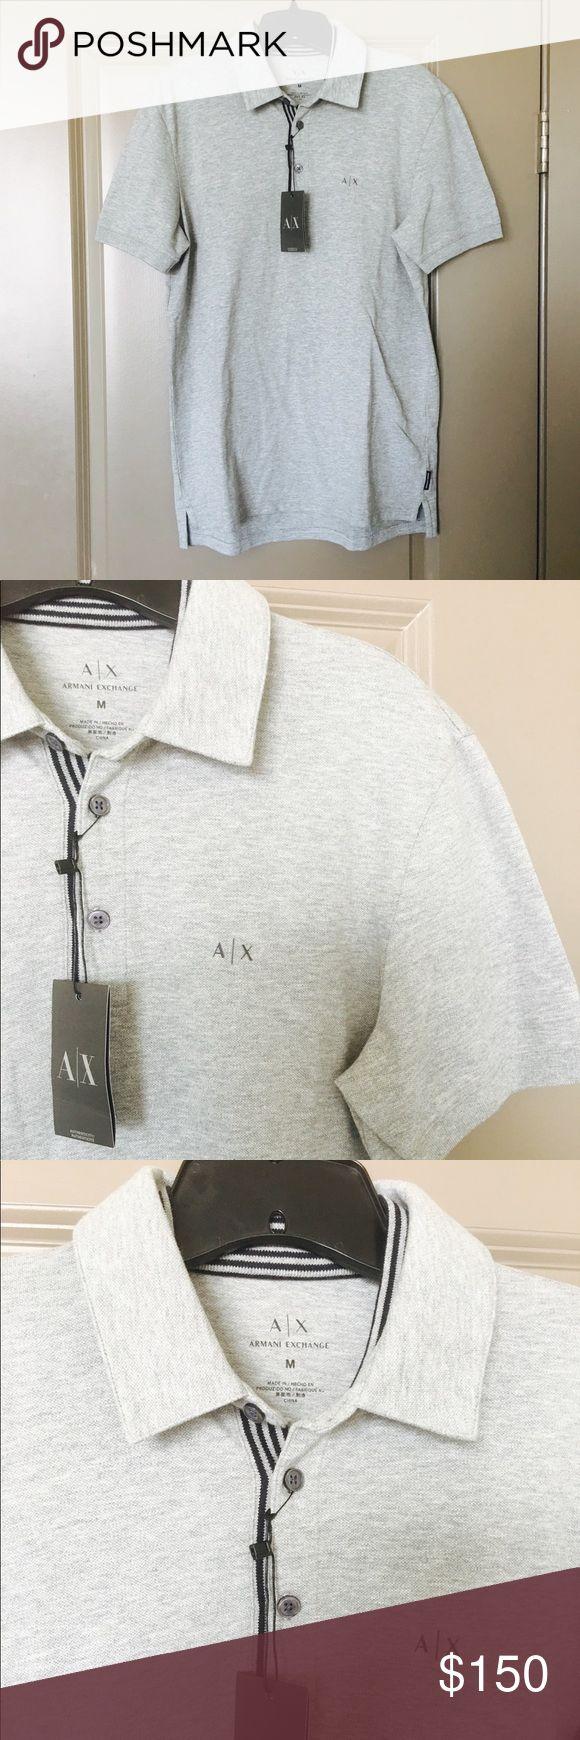 SALEArmani Exchange Polo Armani Exchange men's size L gray polo. Inside striping detail on the collar. Brand new with tags. Armani Exchange Shirts Polos